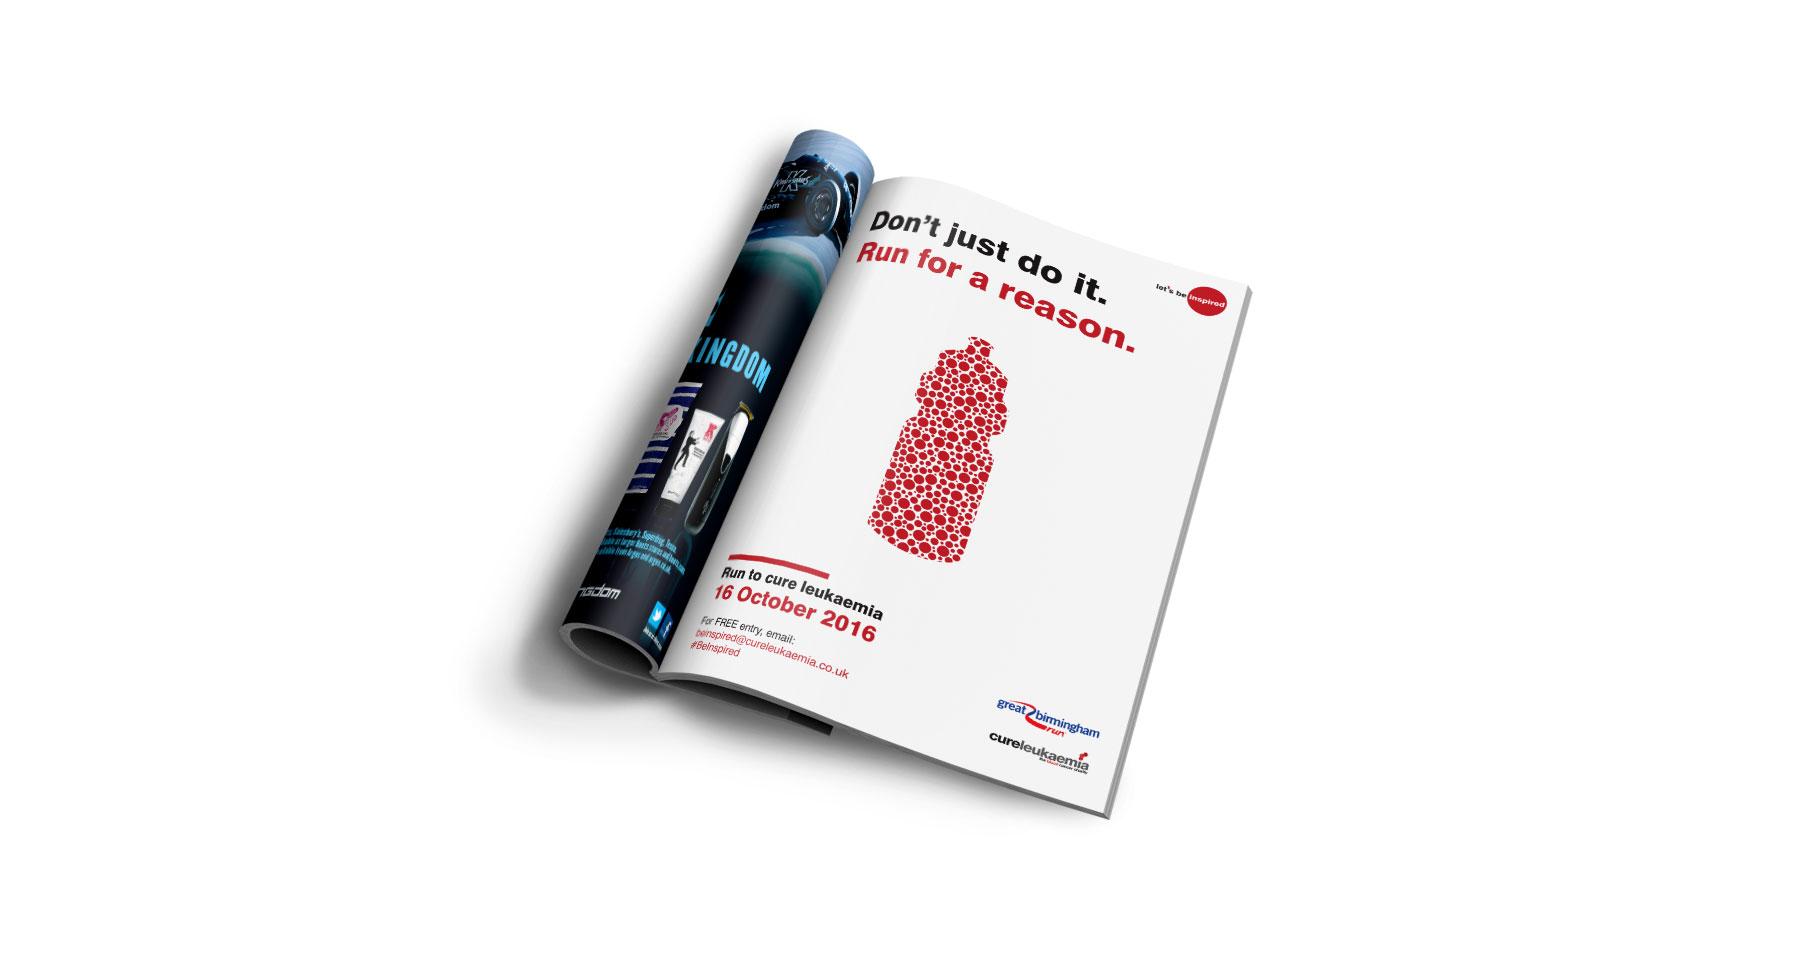 A mockup of Cure Leukaemia's campaign on a magazine